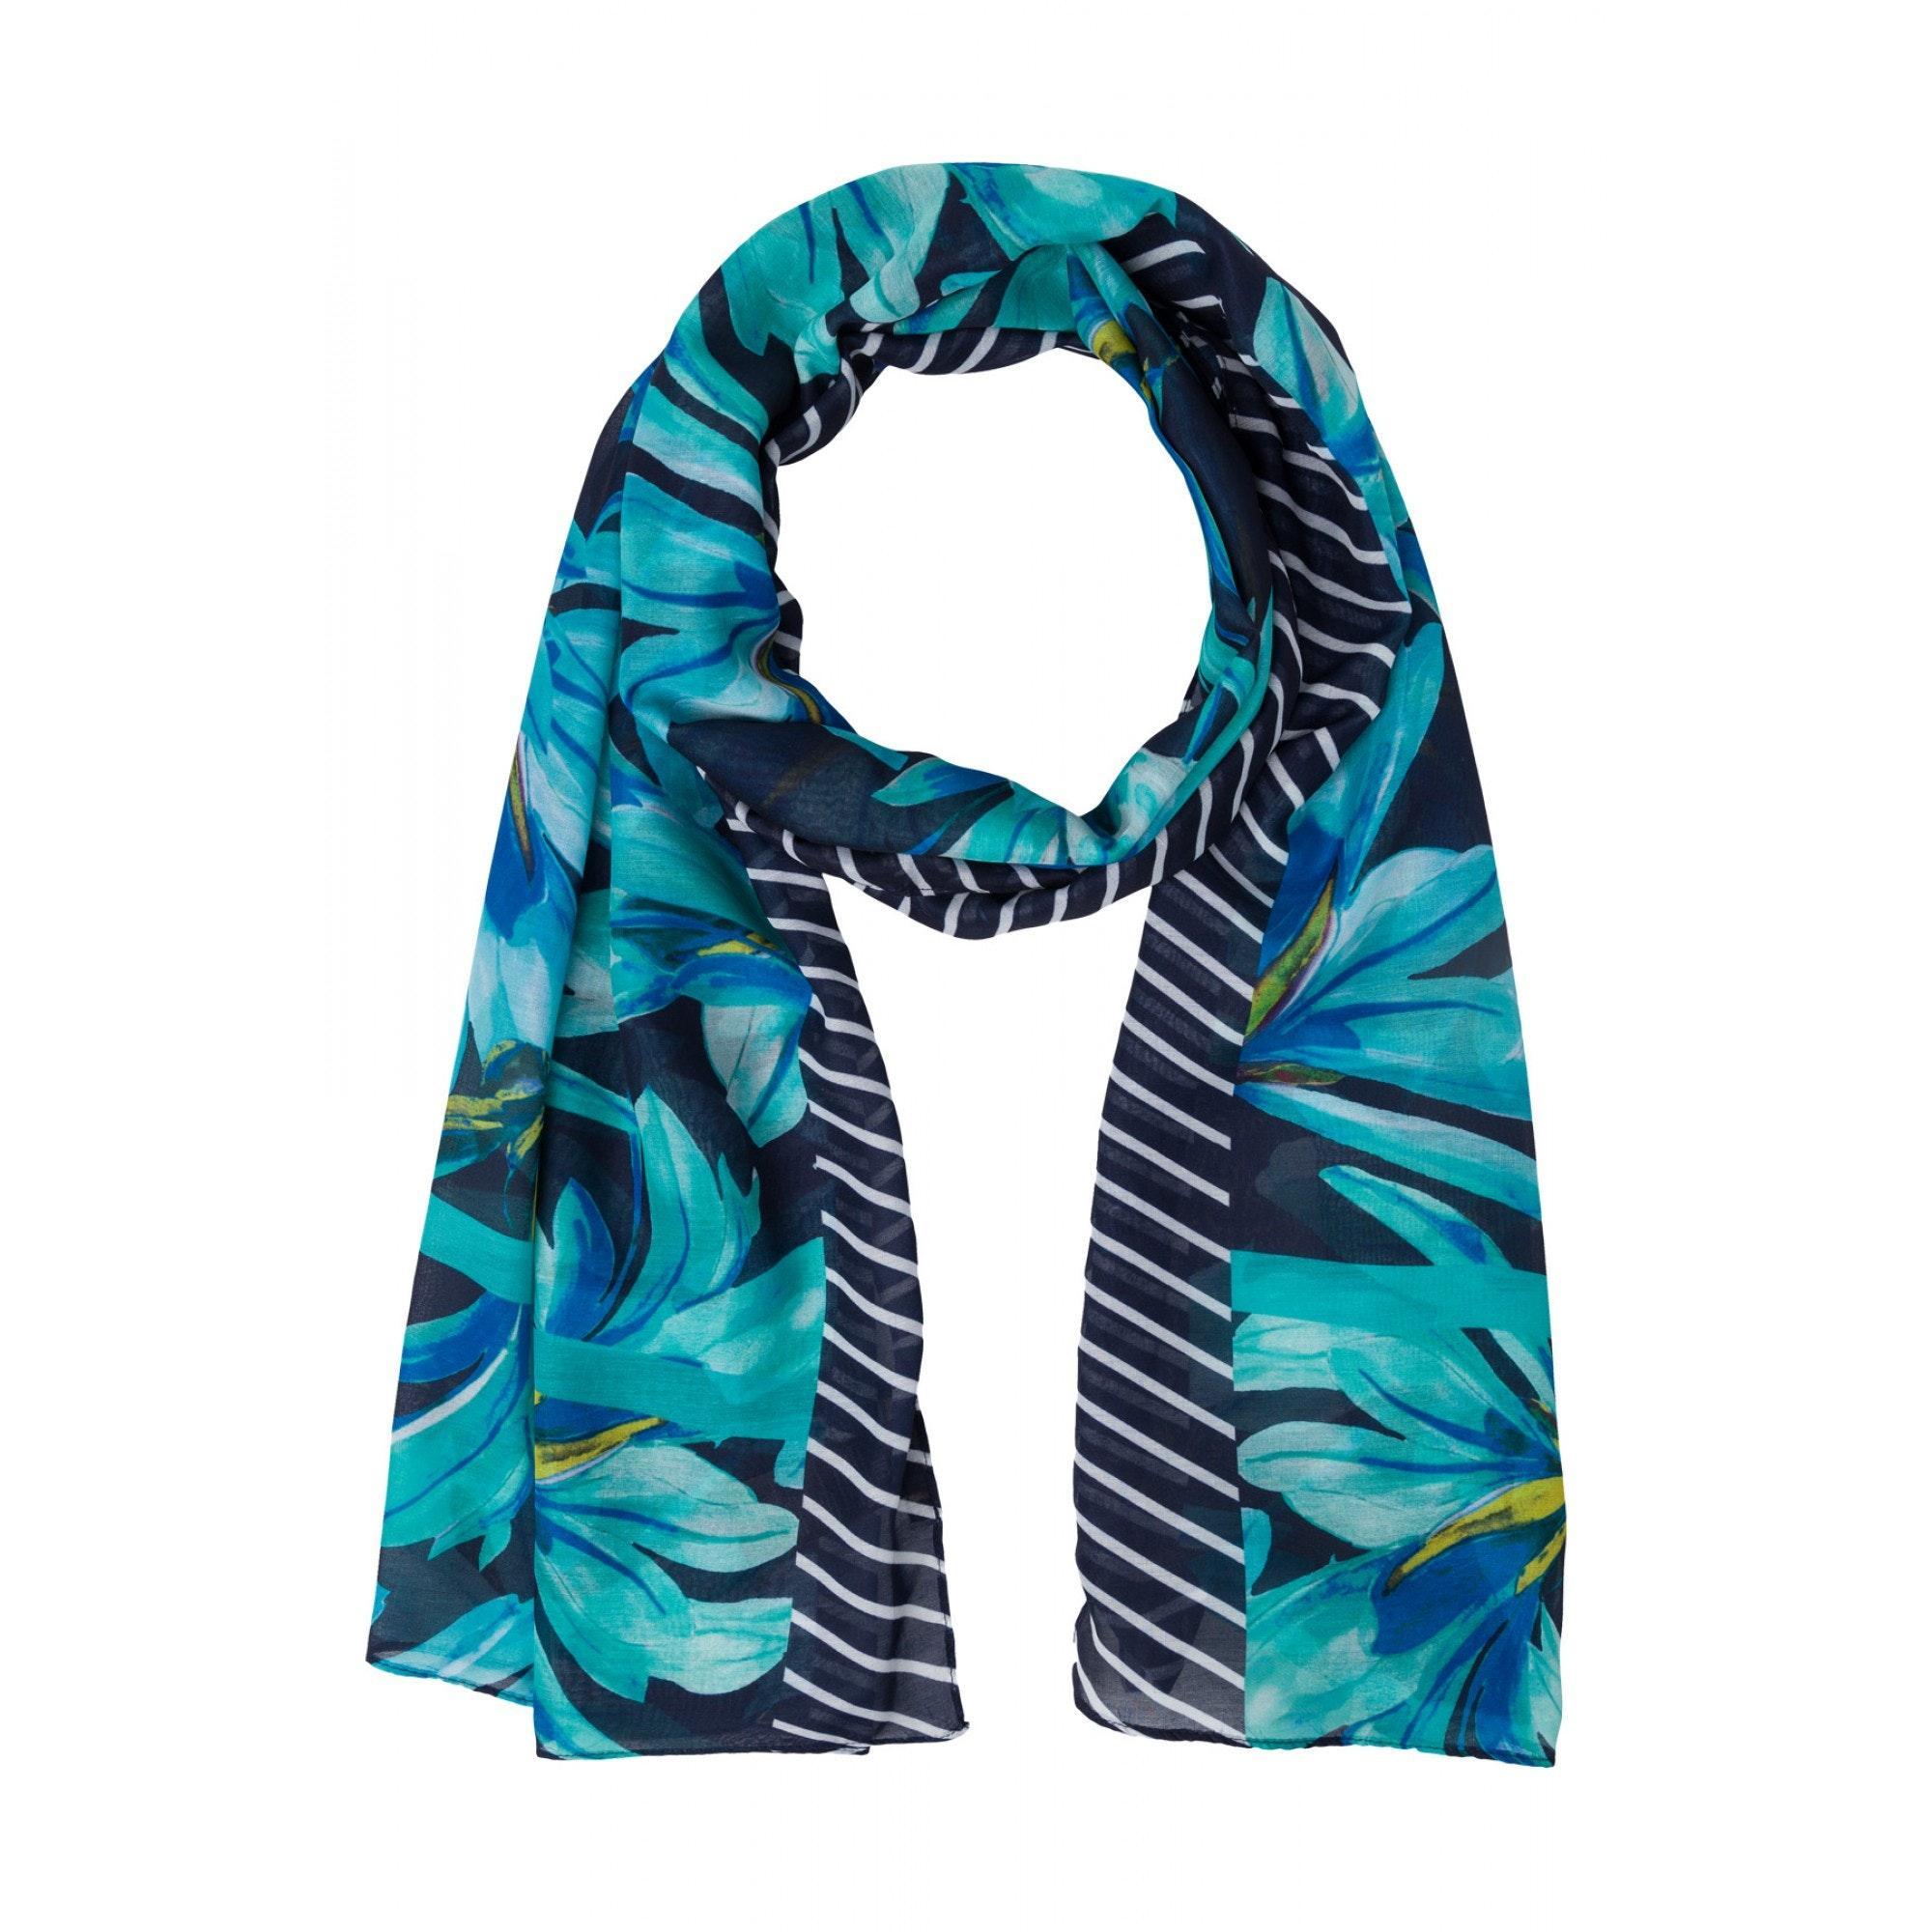 More&More Schal